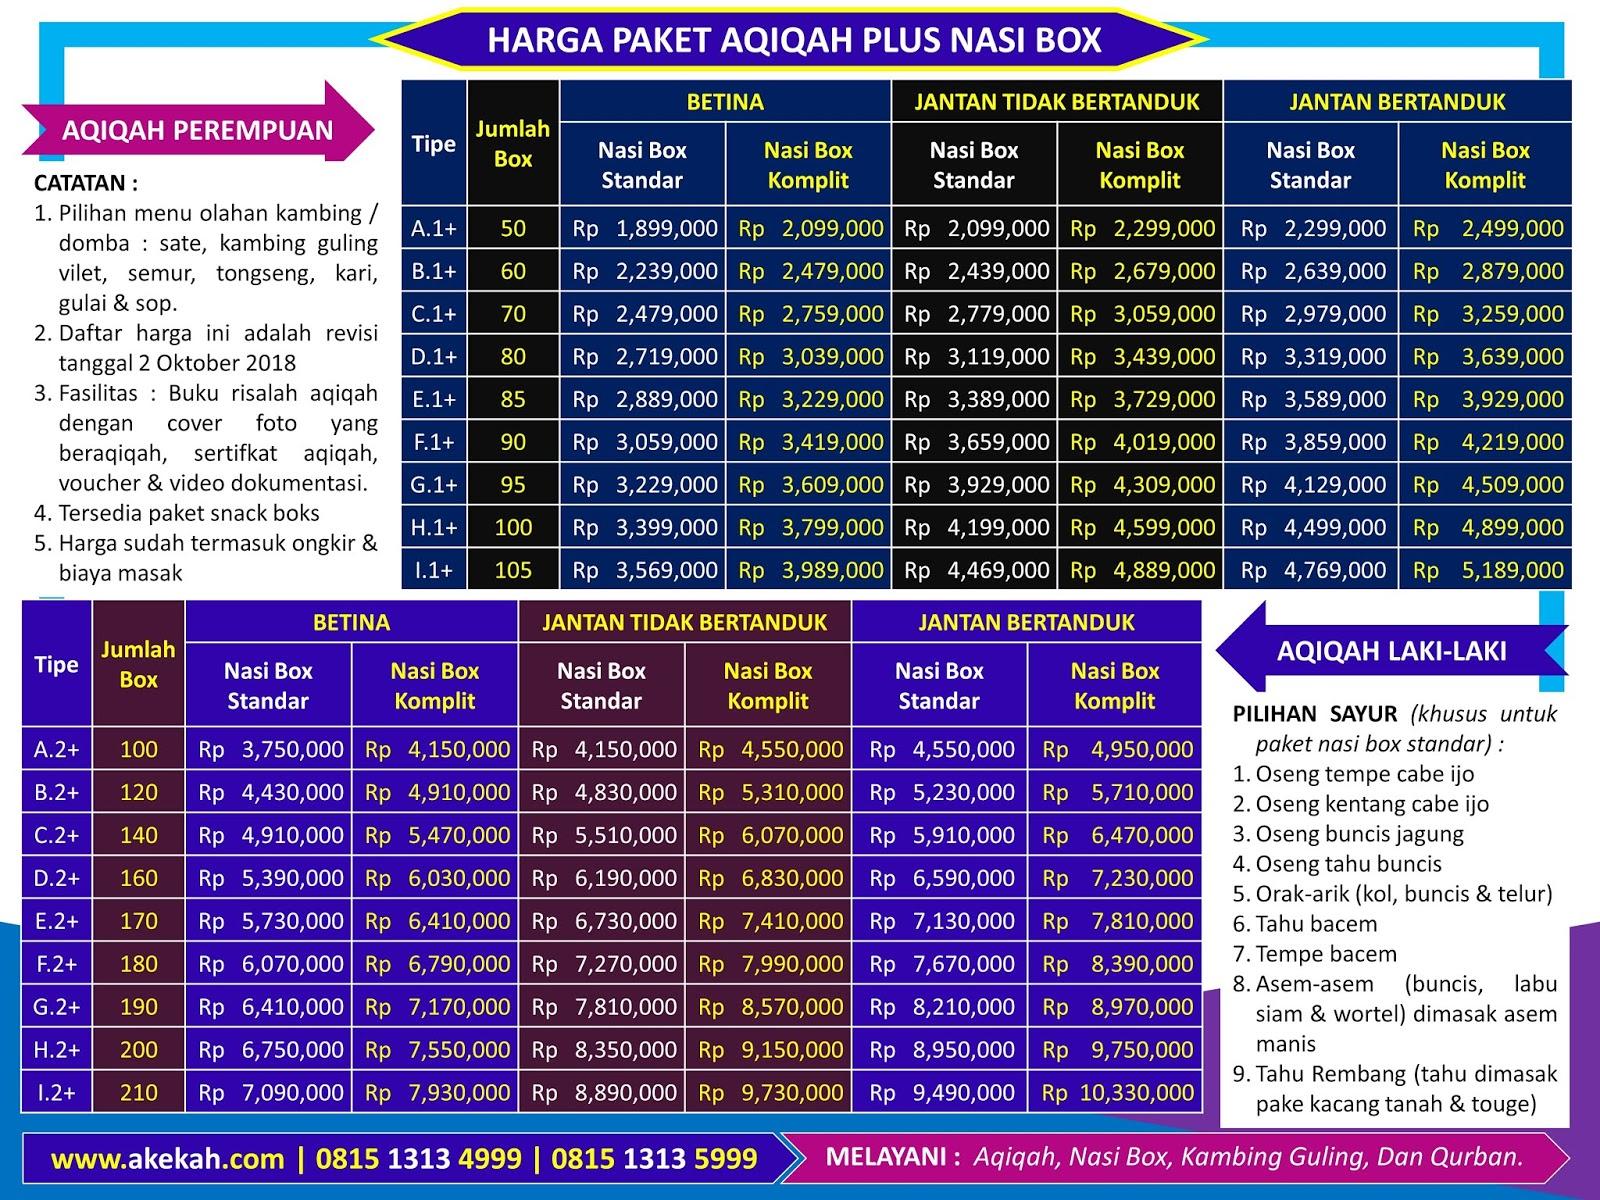 Harga Paket Aqiqah Dan Catering Murah Untuk Anak Laki-Laki Daerah Bogor Jawa Barat